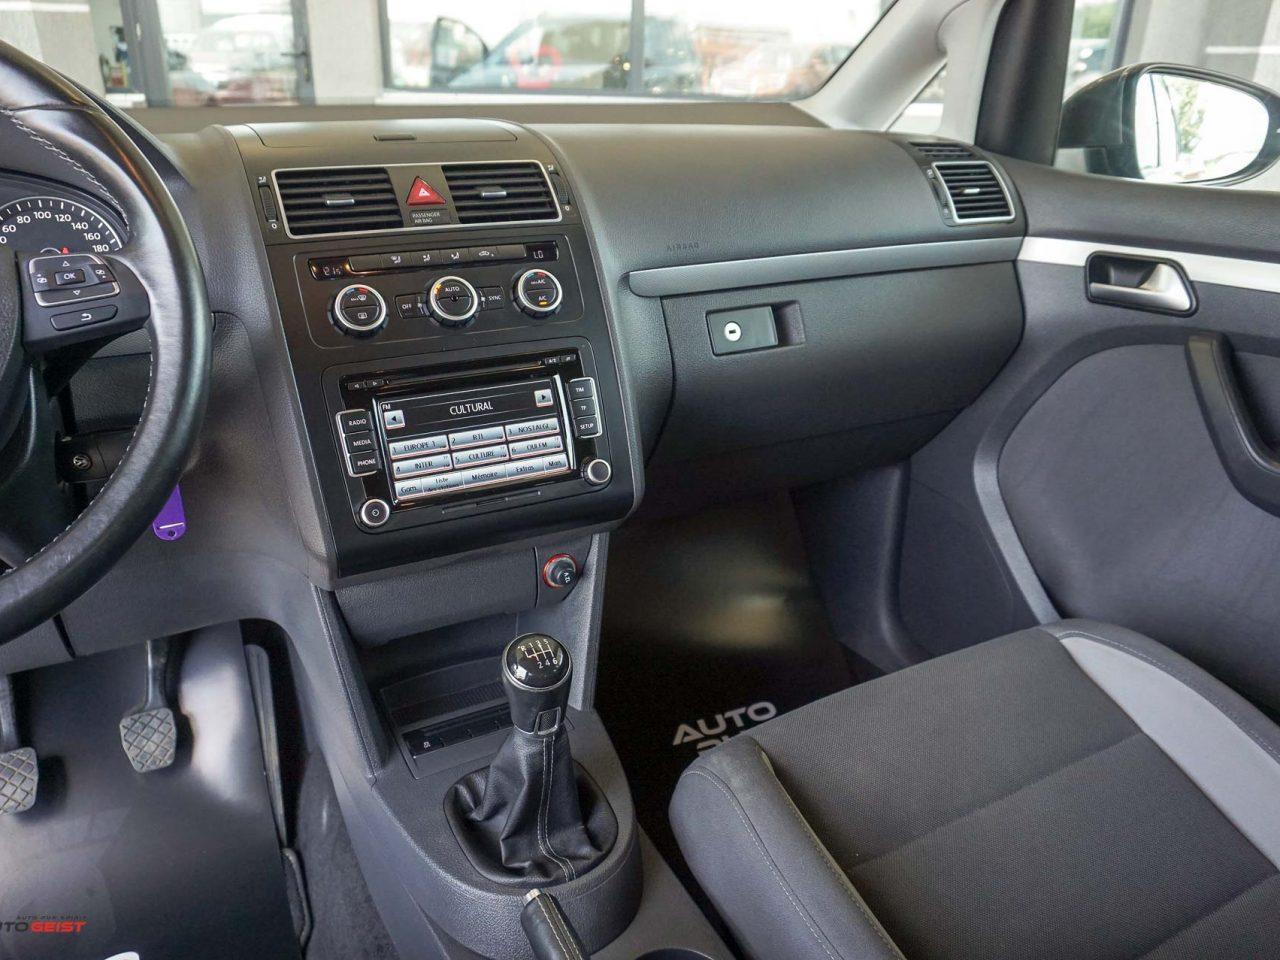 661-volkswagen-touran-gri-manual-01823